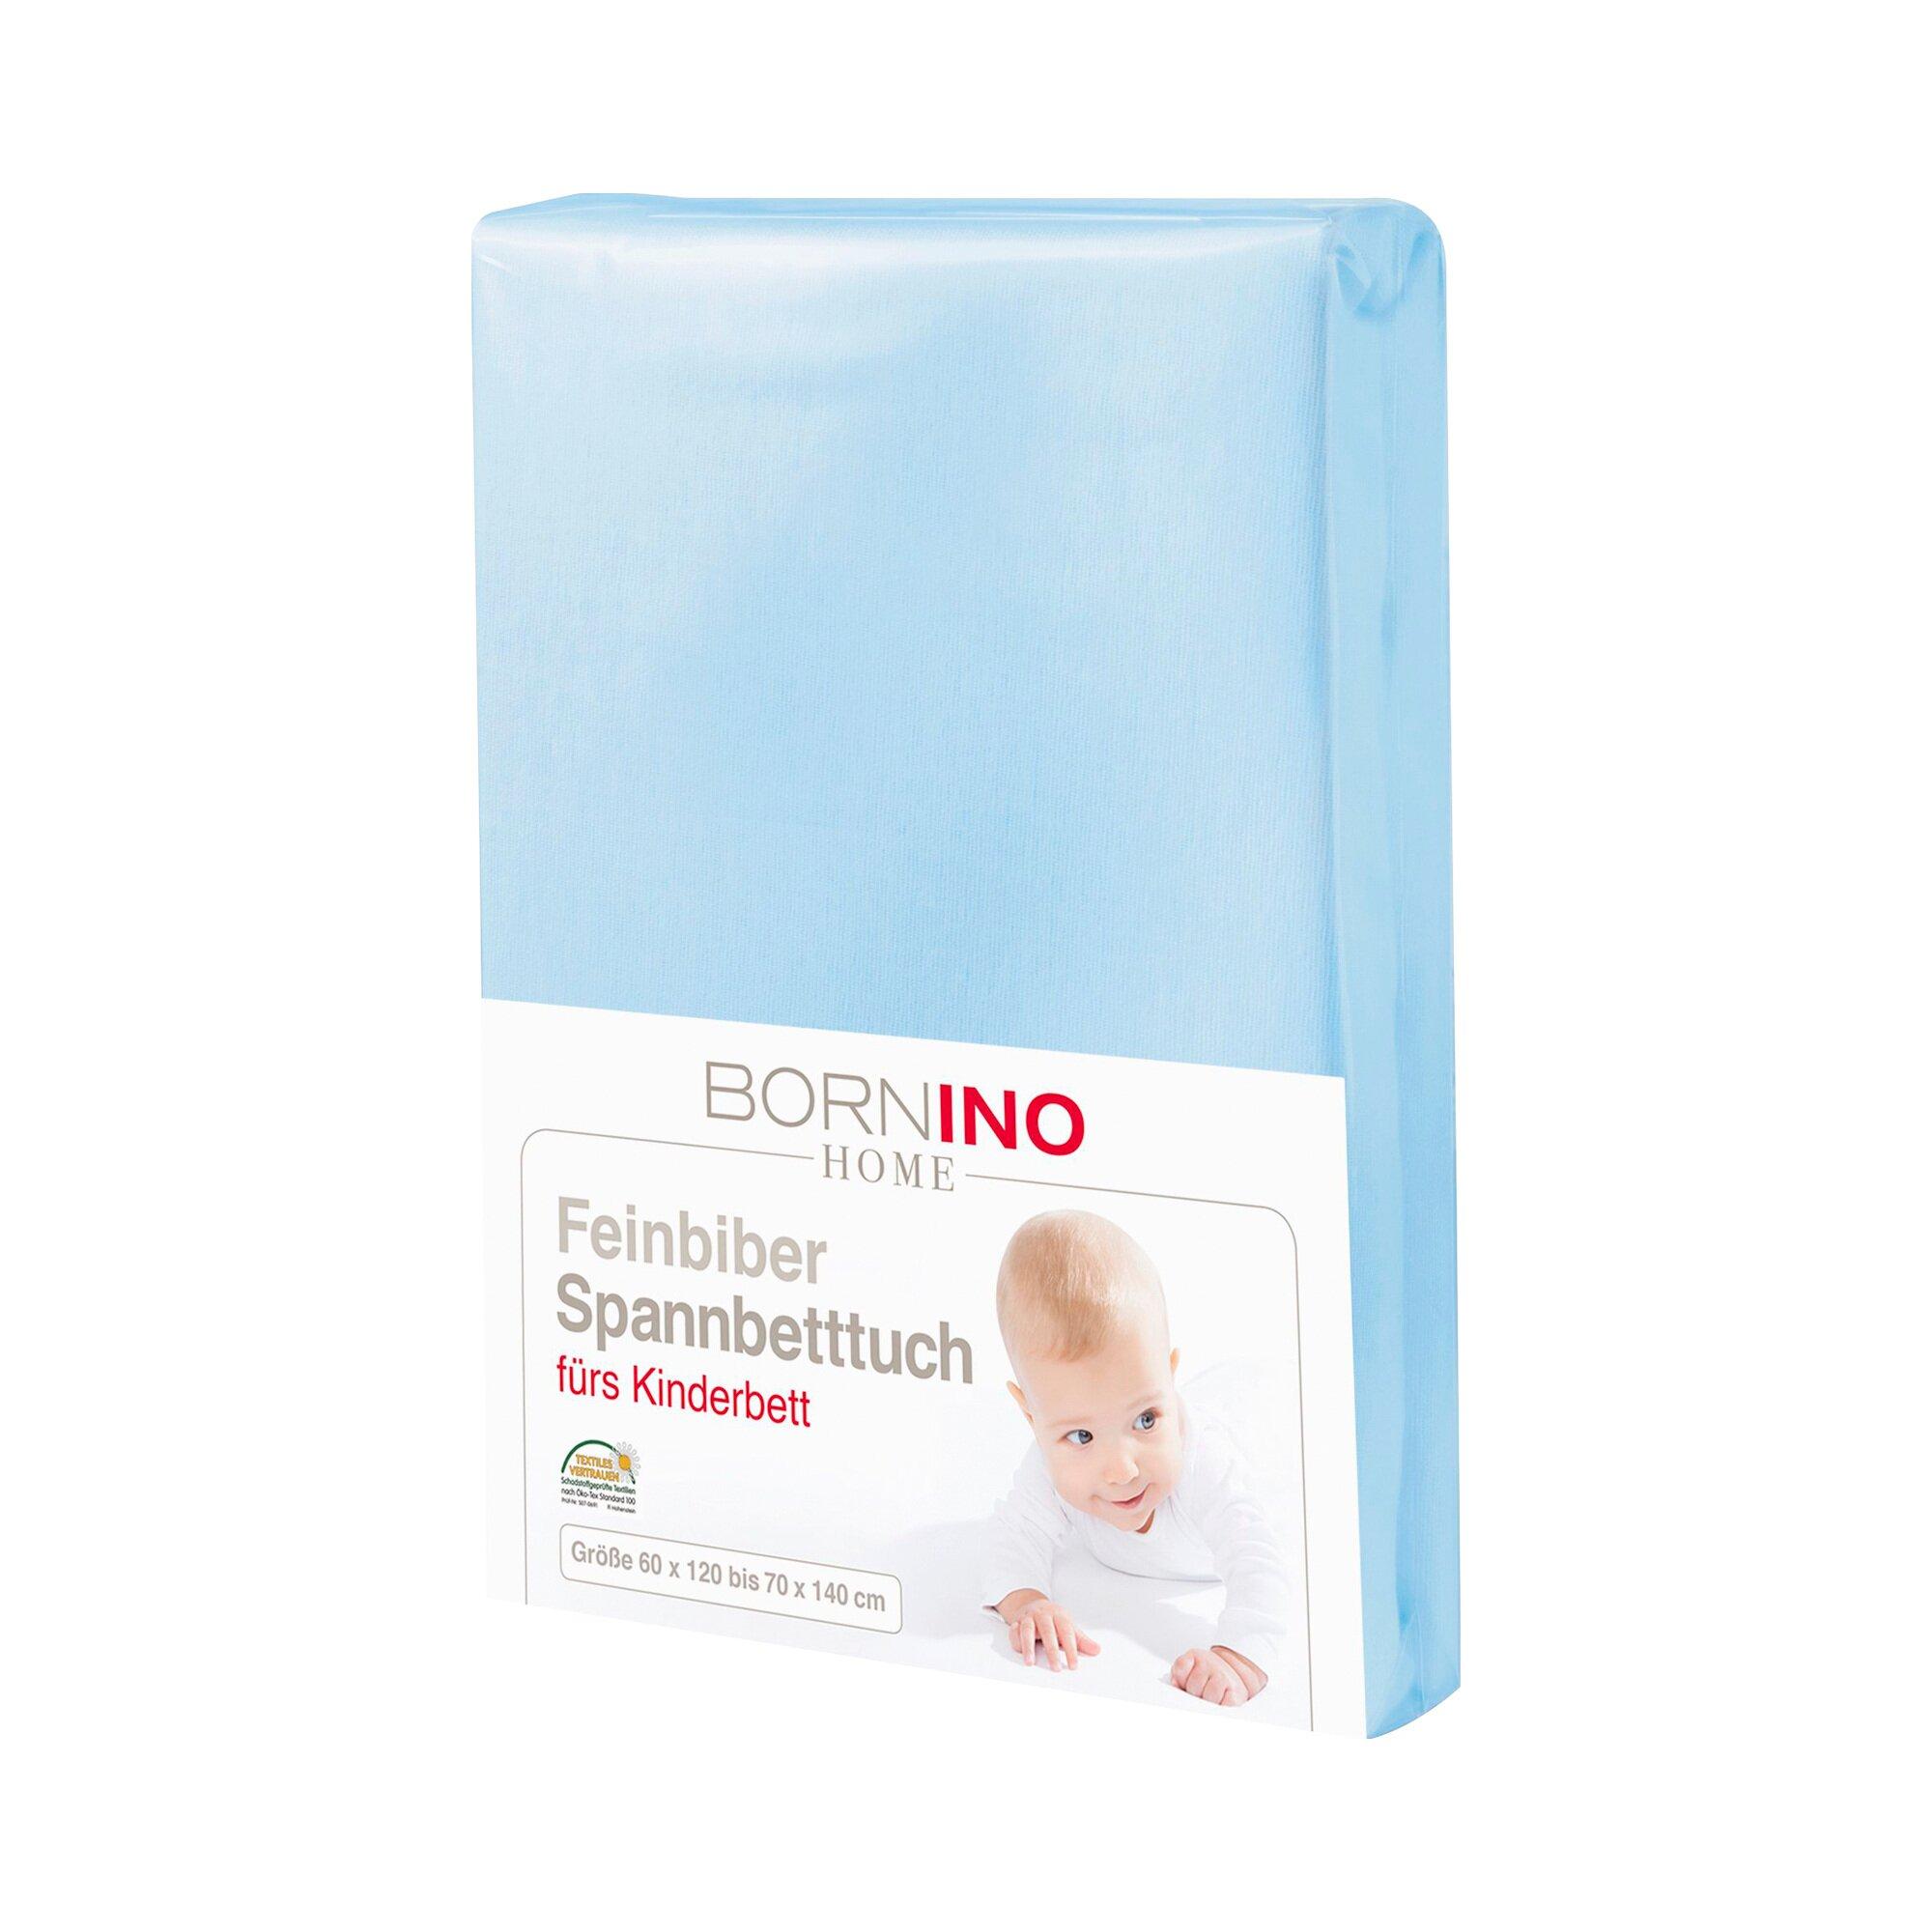 Bornino Home Feinbiber-Spannbetttuch 60x120 cm - 70x140 cm hellblau 70